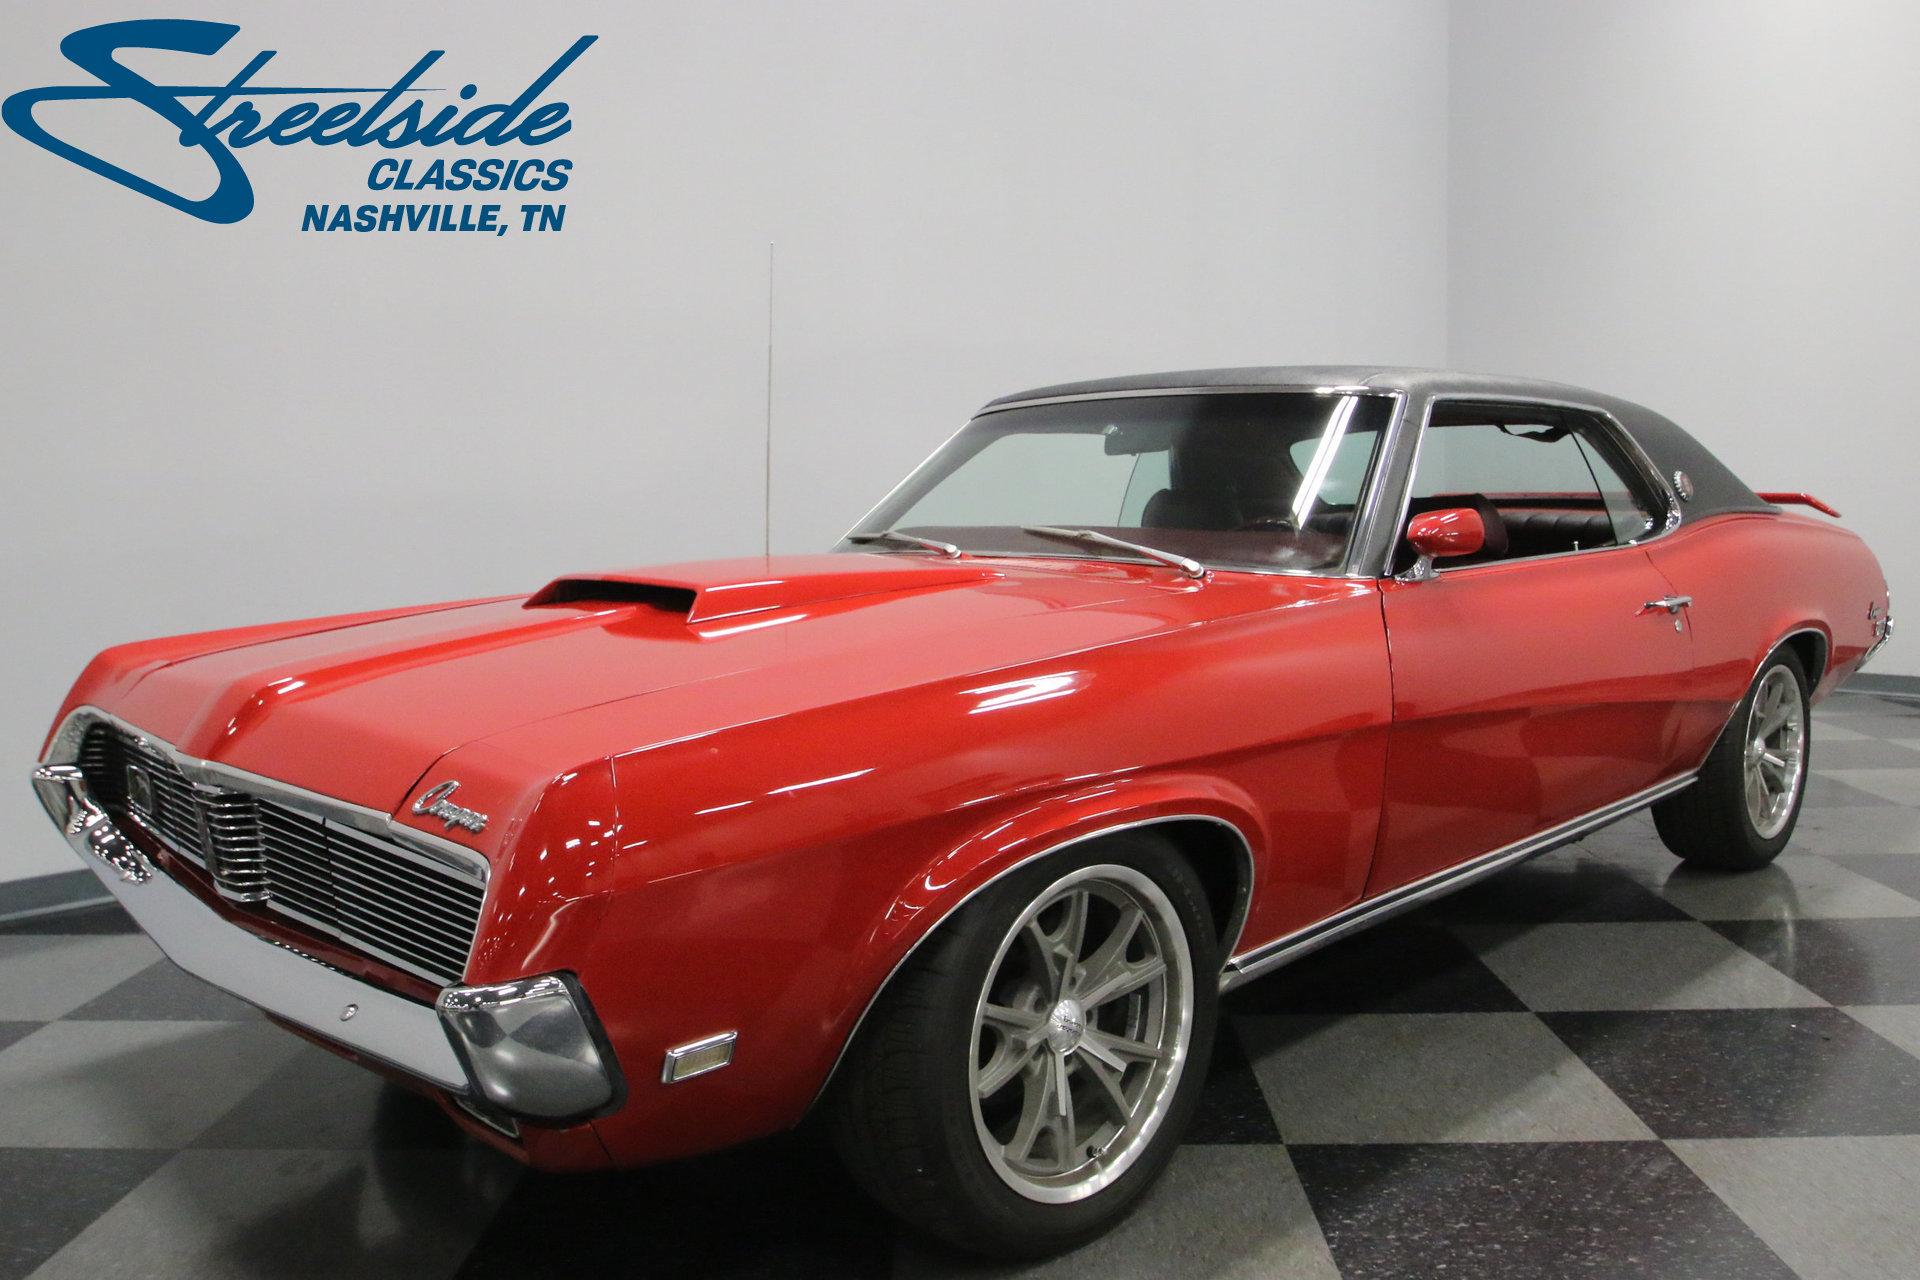 1969 Mercury Cougar | My Classic Garage